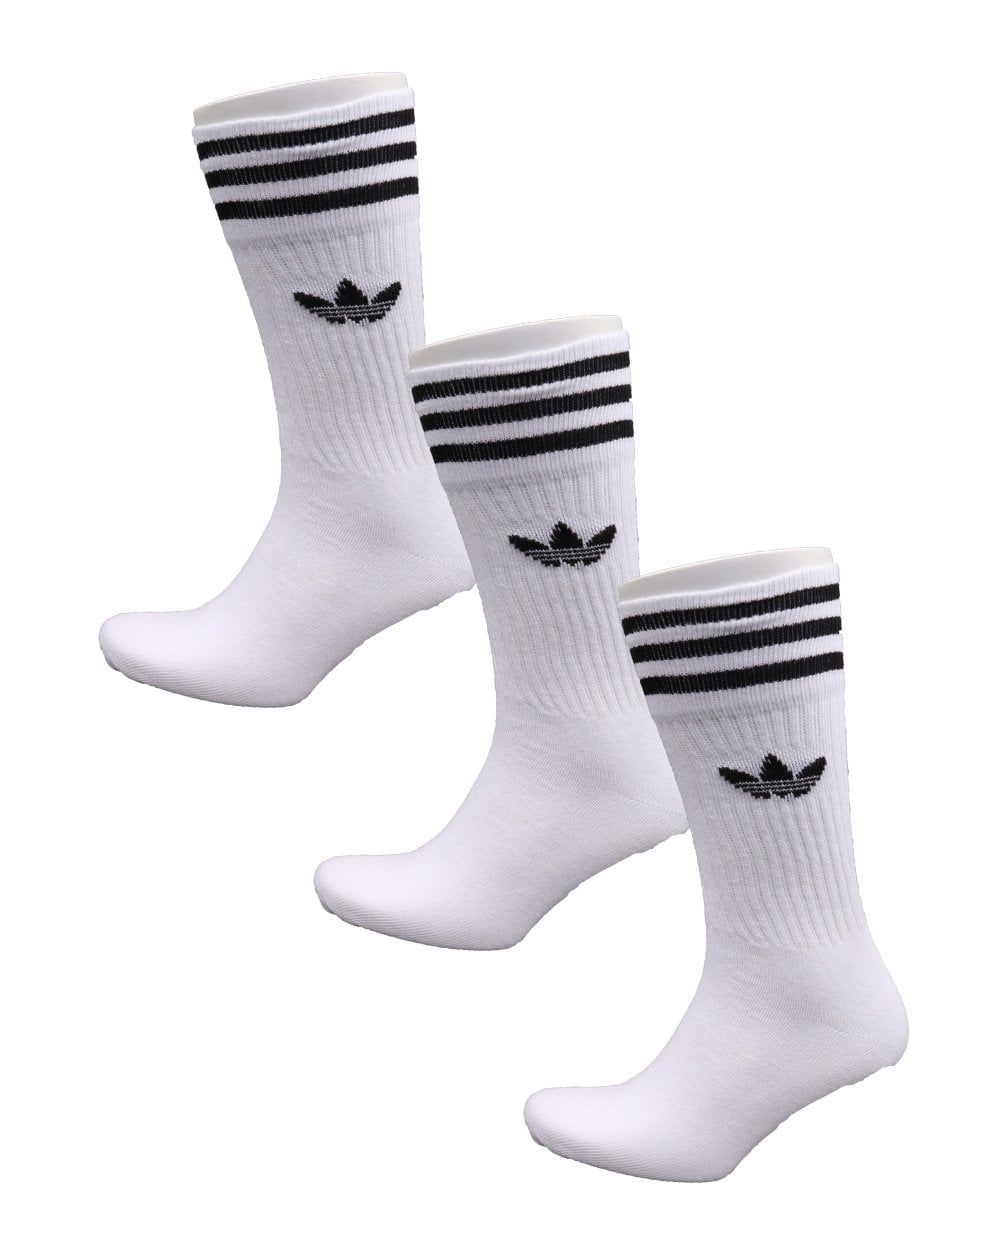 Hummel Three Pack Crew Socks White//Black All Sizes NEW